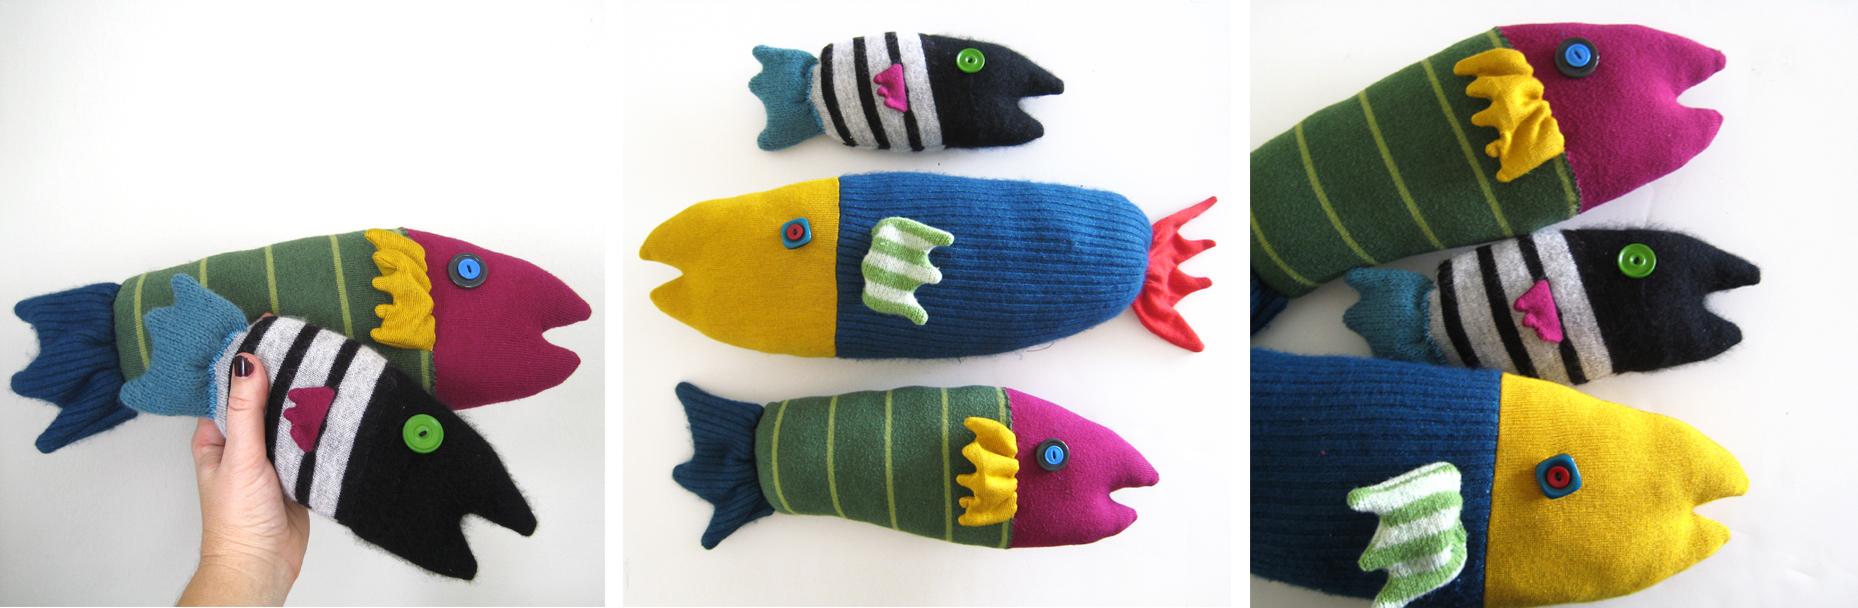 School of Fish_No 1.jpg